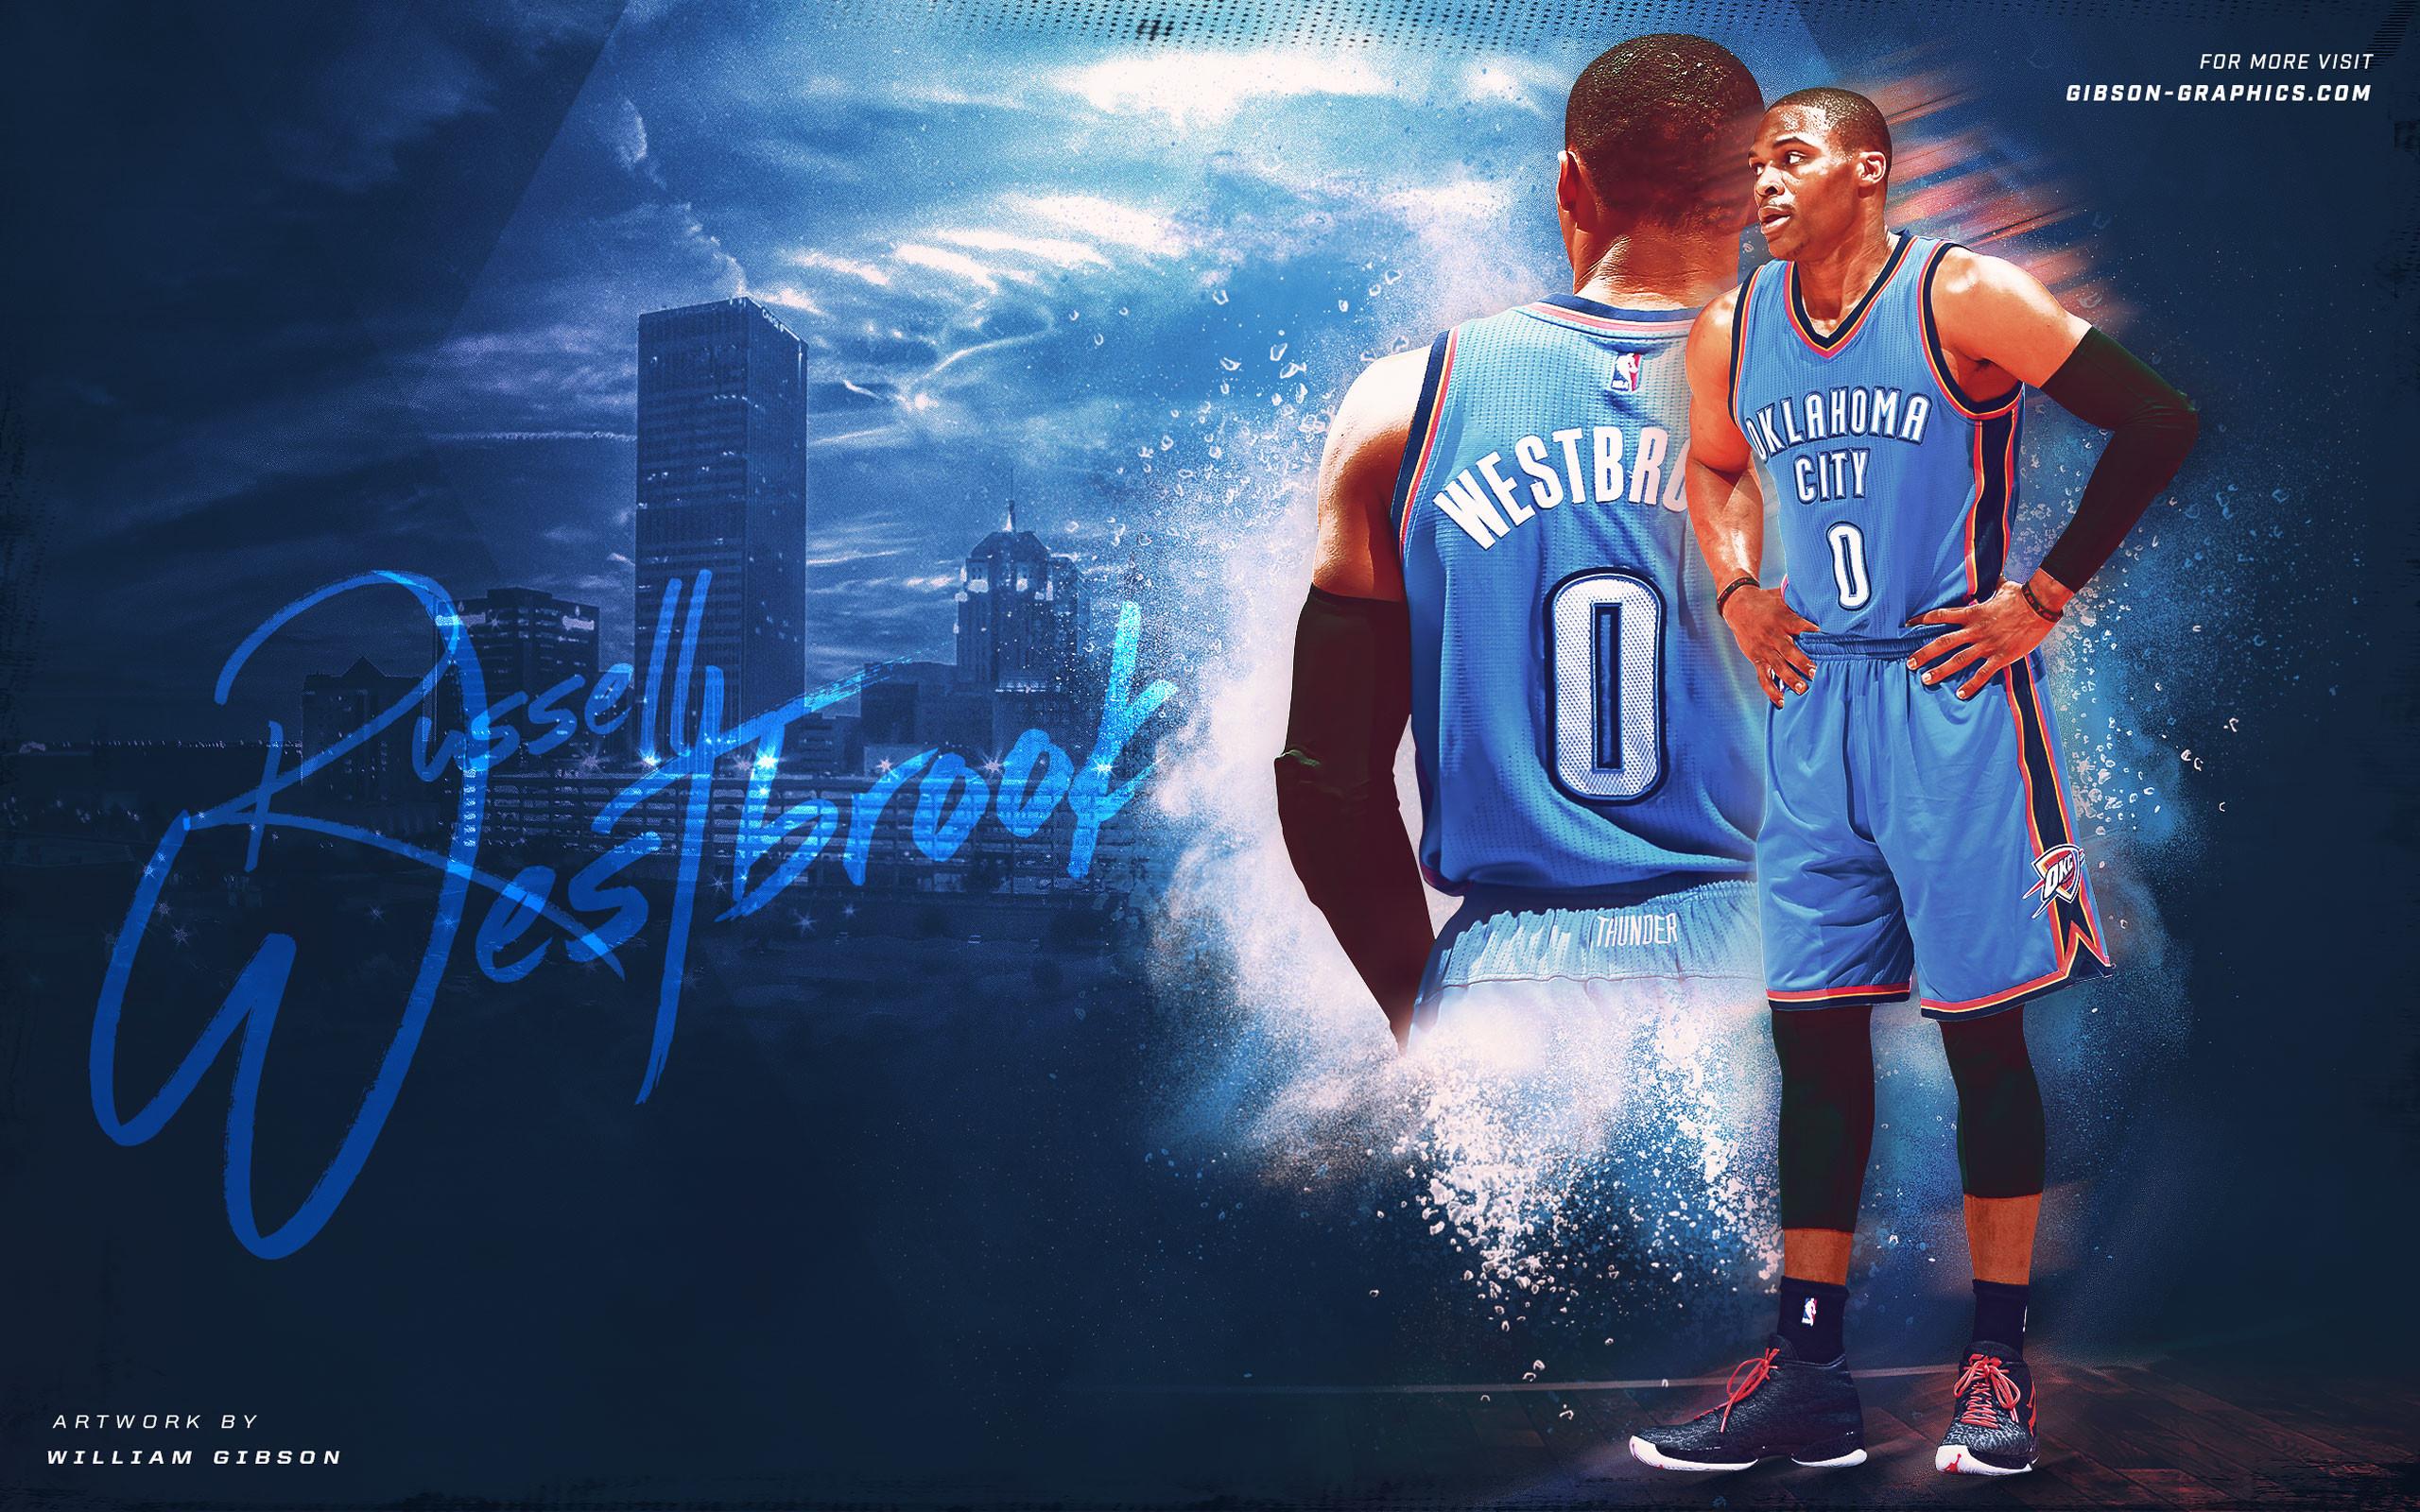 Russell Westbrook OKC Thunder 2016 Wallpaper